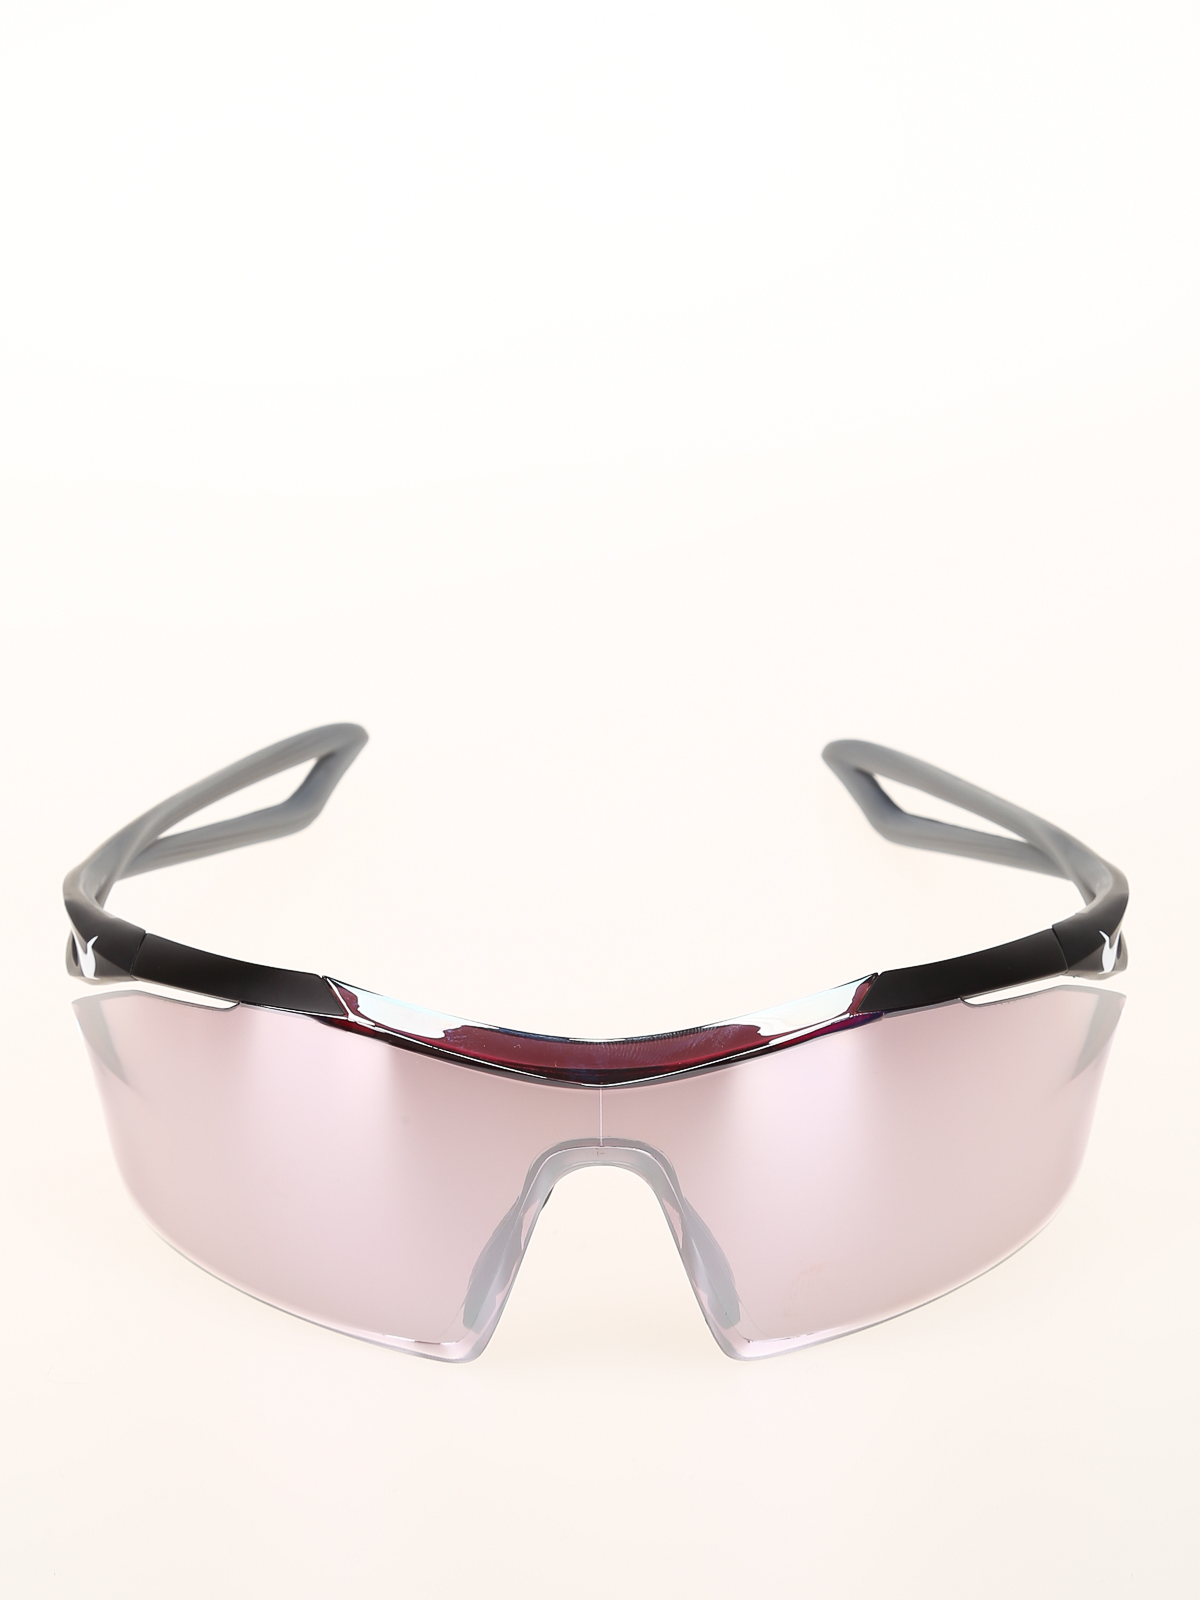 Ausencia Sinis salvar  Nike - Vaporwing Elite sunglasses - sunglasses - EV0913011   iKRIX.com